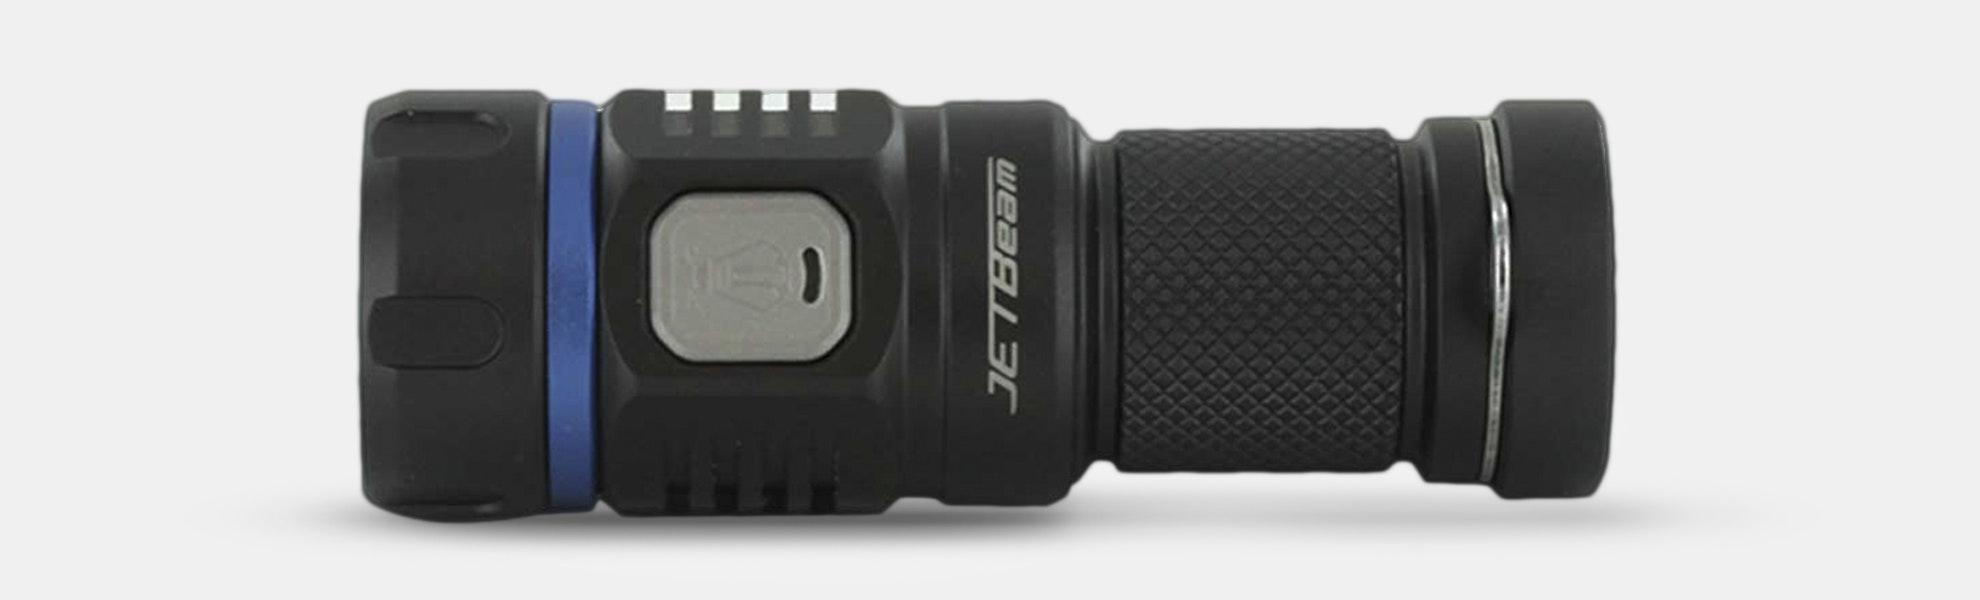 JETBeam E20R 990-Lumen Rechargeable Flashlight